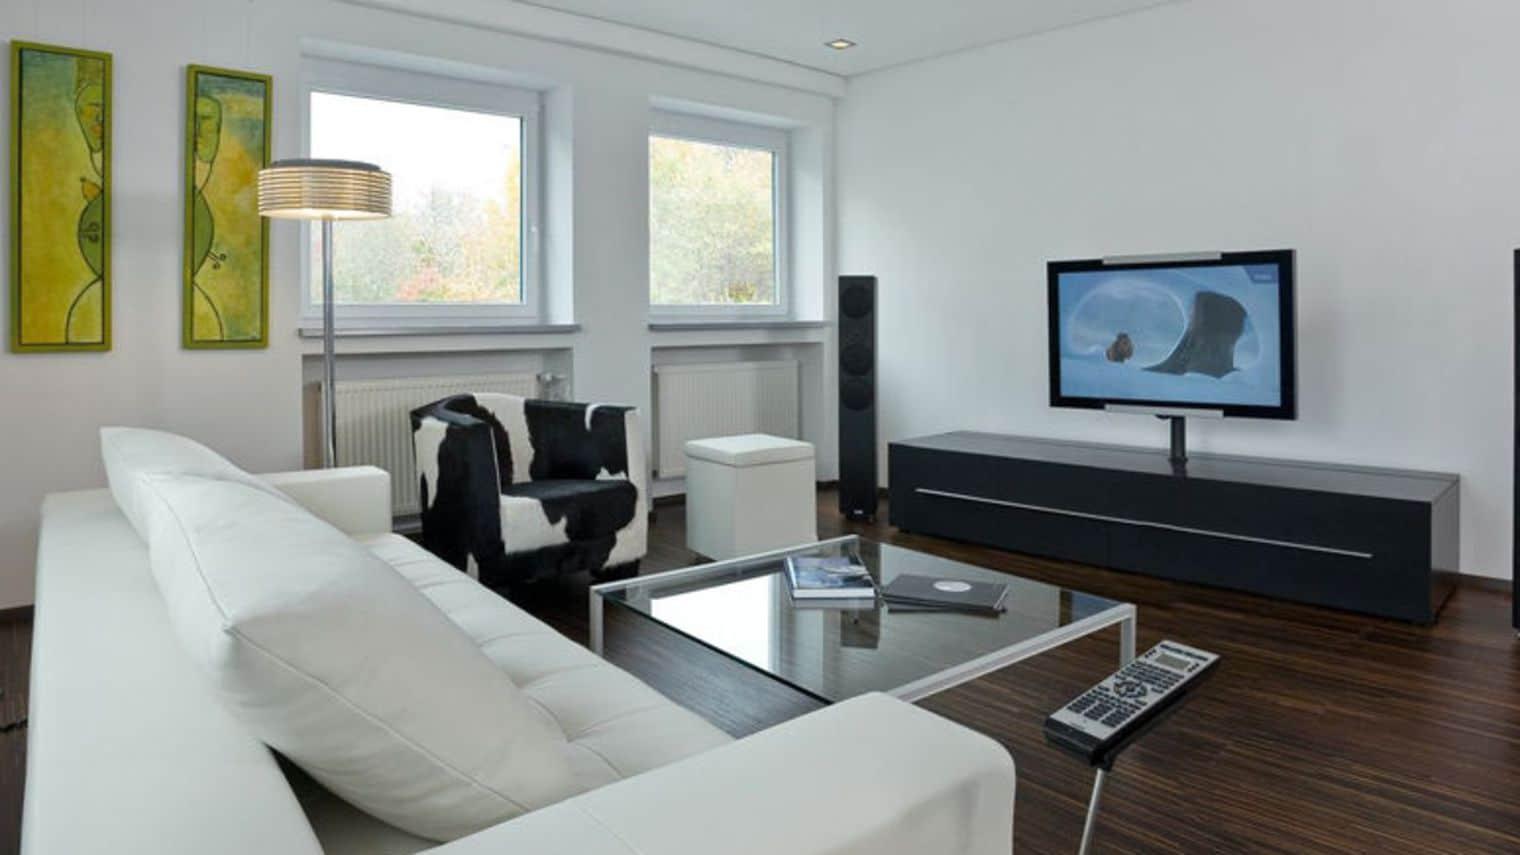 les infos savoir pour mieux choisir son home cin ma. Black Bedroom Furniture Sets. Home Design Ideas